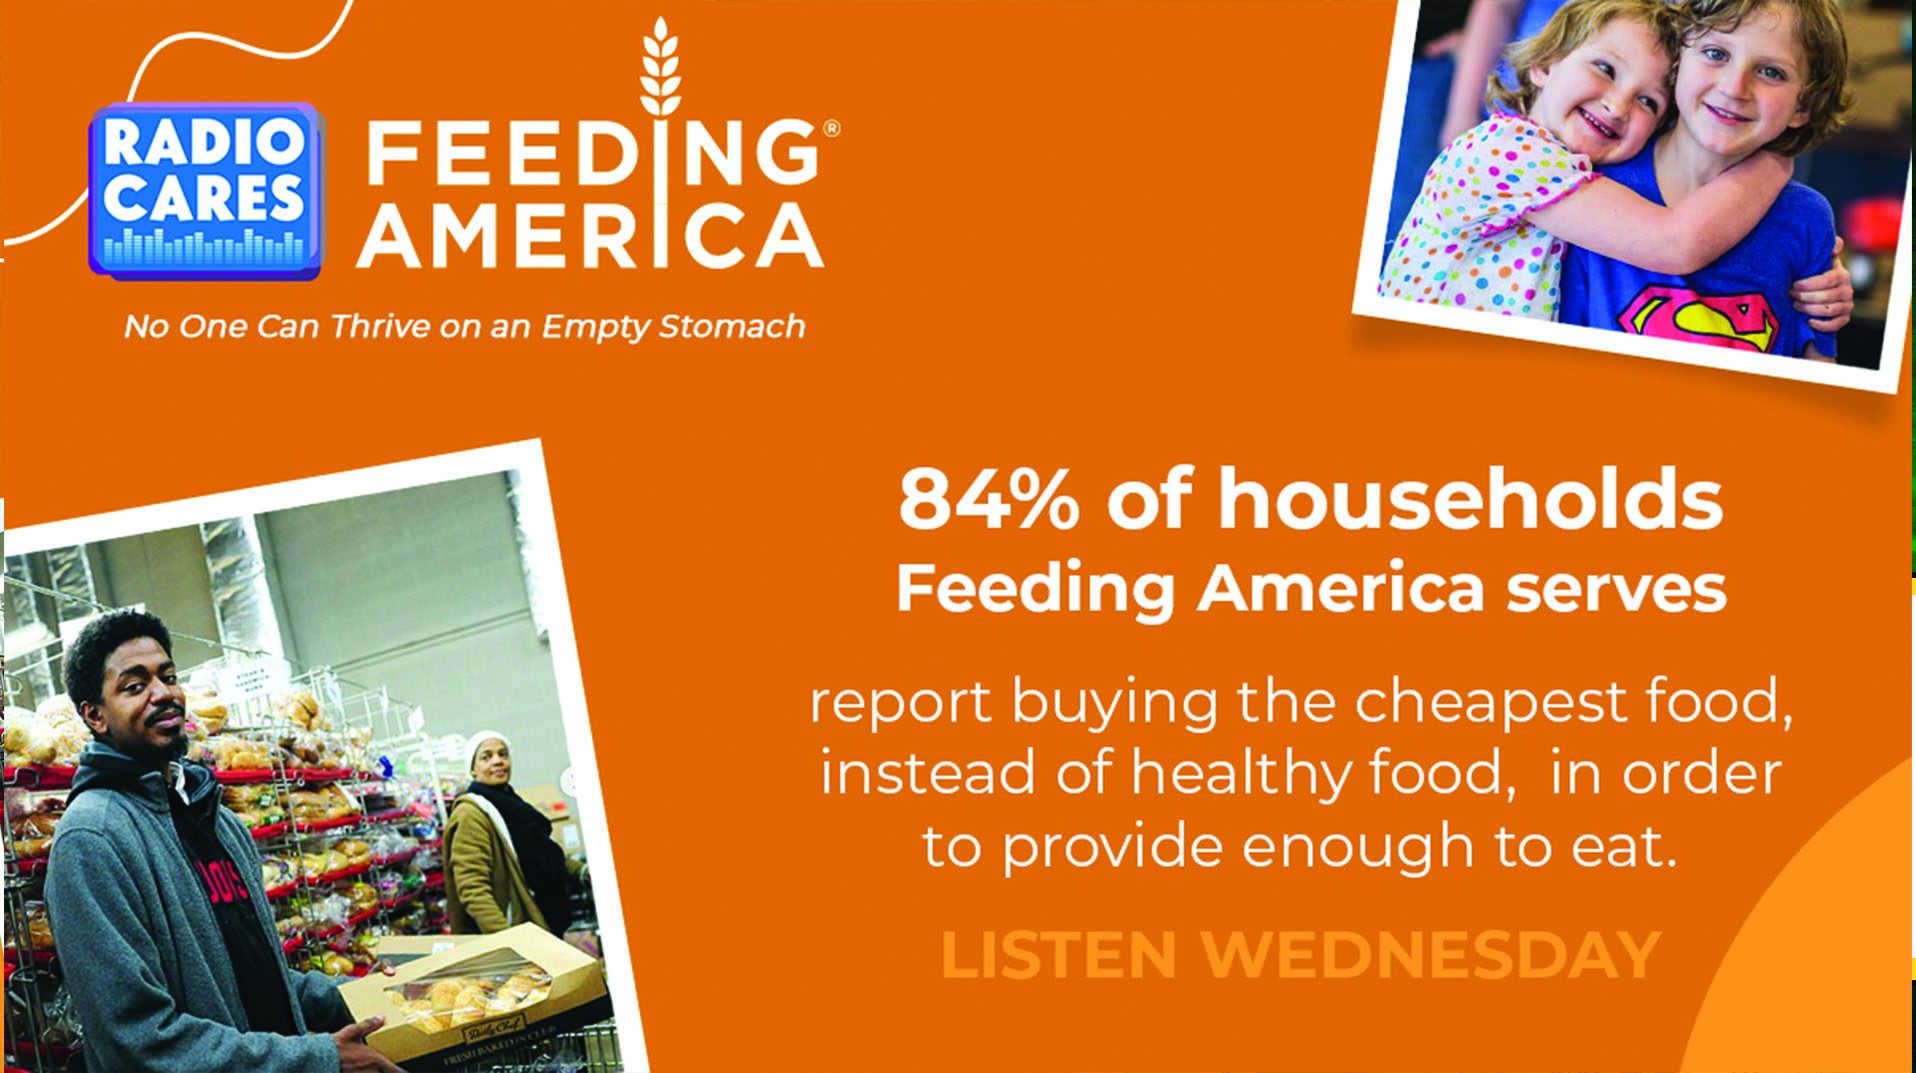 Radio Cares – Feeding America This Wednesday